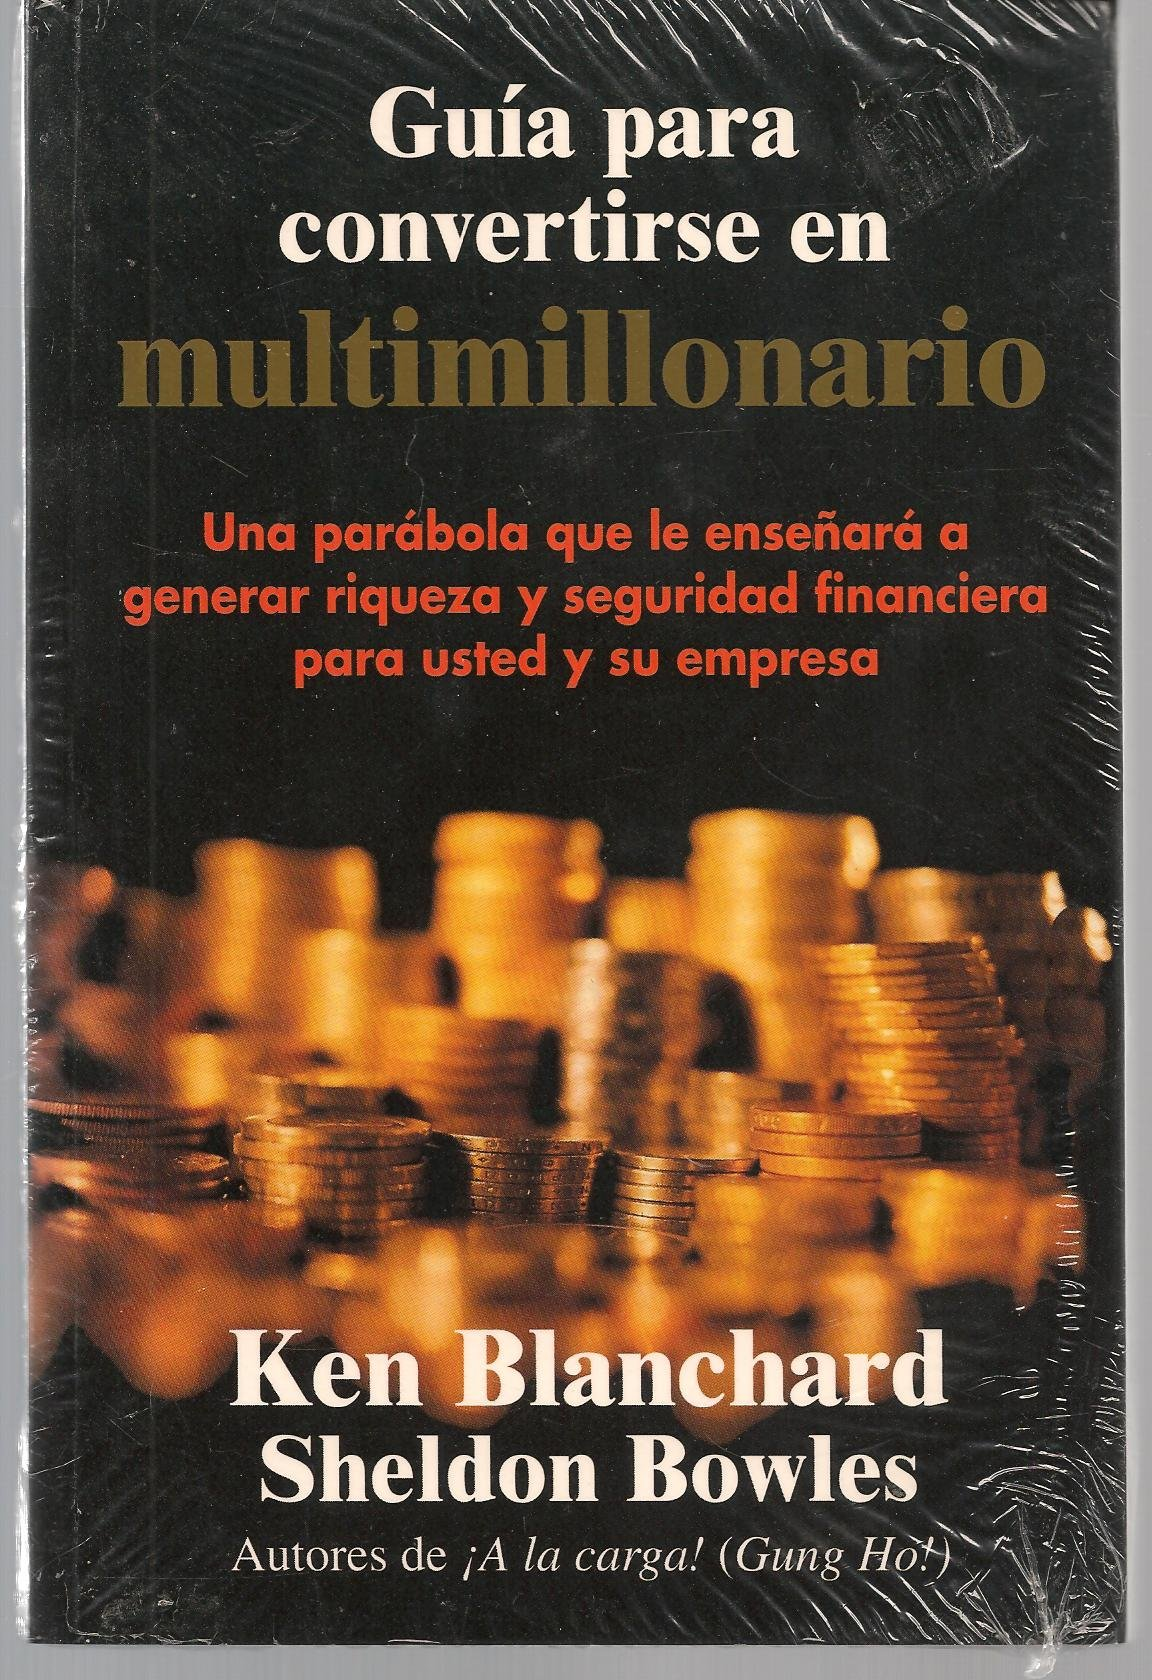 Download Guia Para Convertirse En Multimillonario (Big Bucks!): How to Make Serious Money for Both You and Your Company pdf